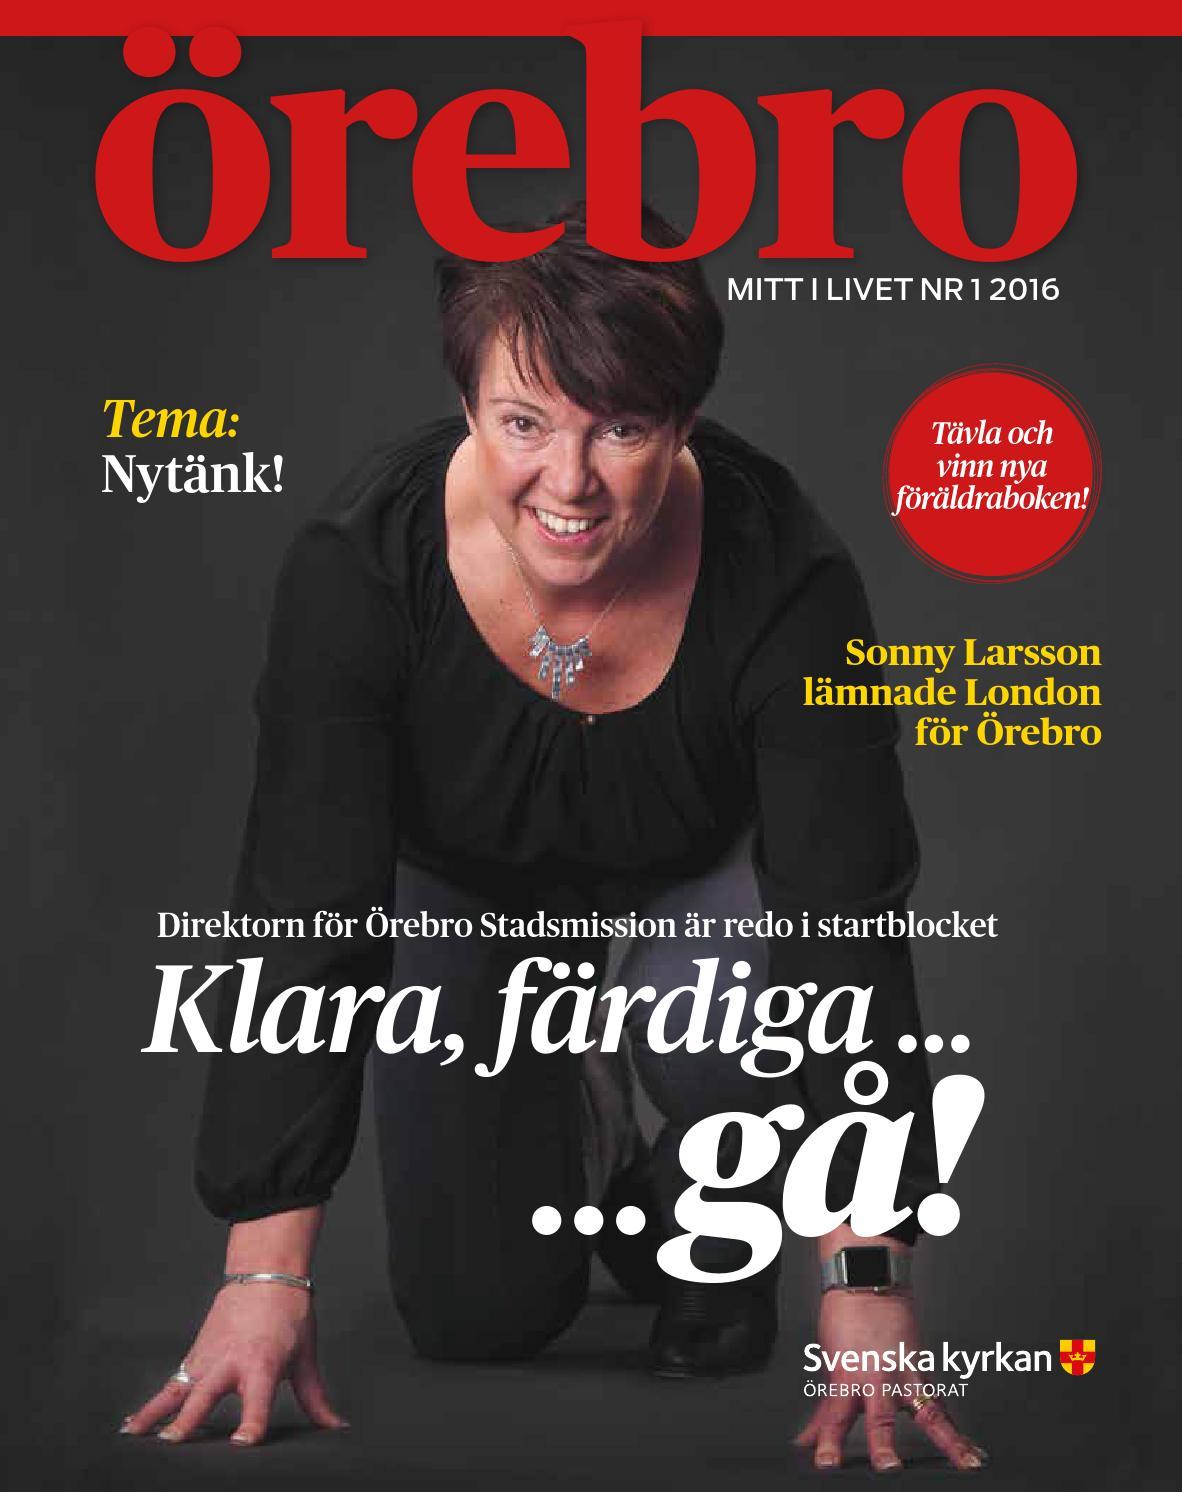 Karin Gunnarsson, 40 r i rebro p Nygatan 47 - adress